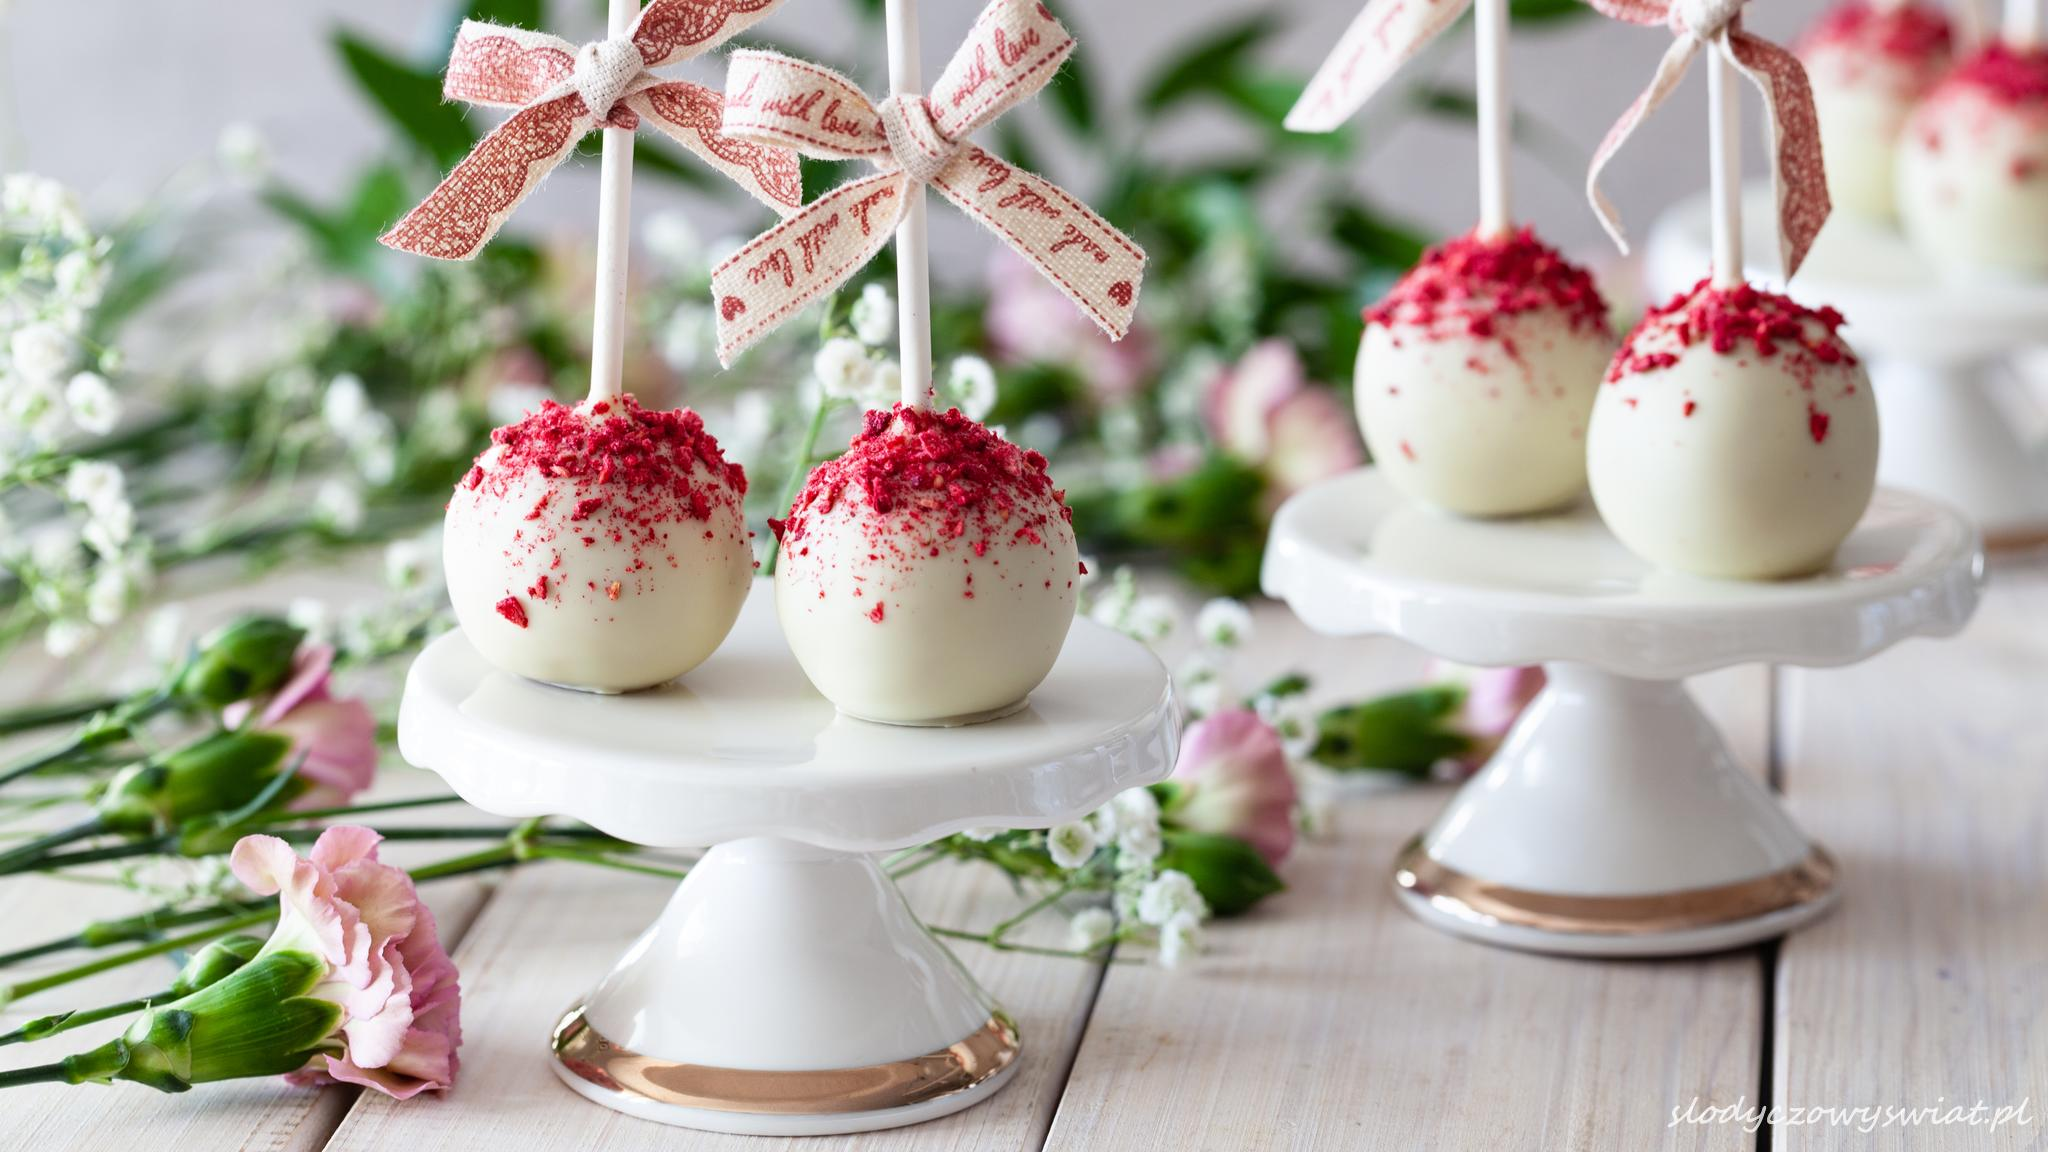 Malinowe cake pops